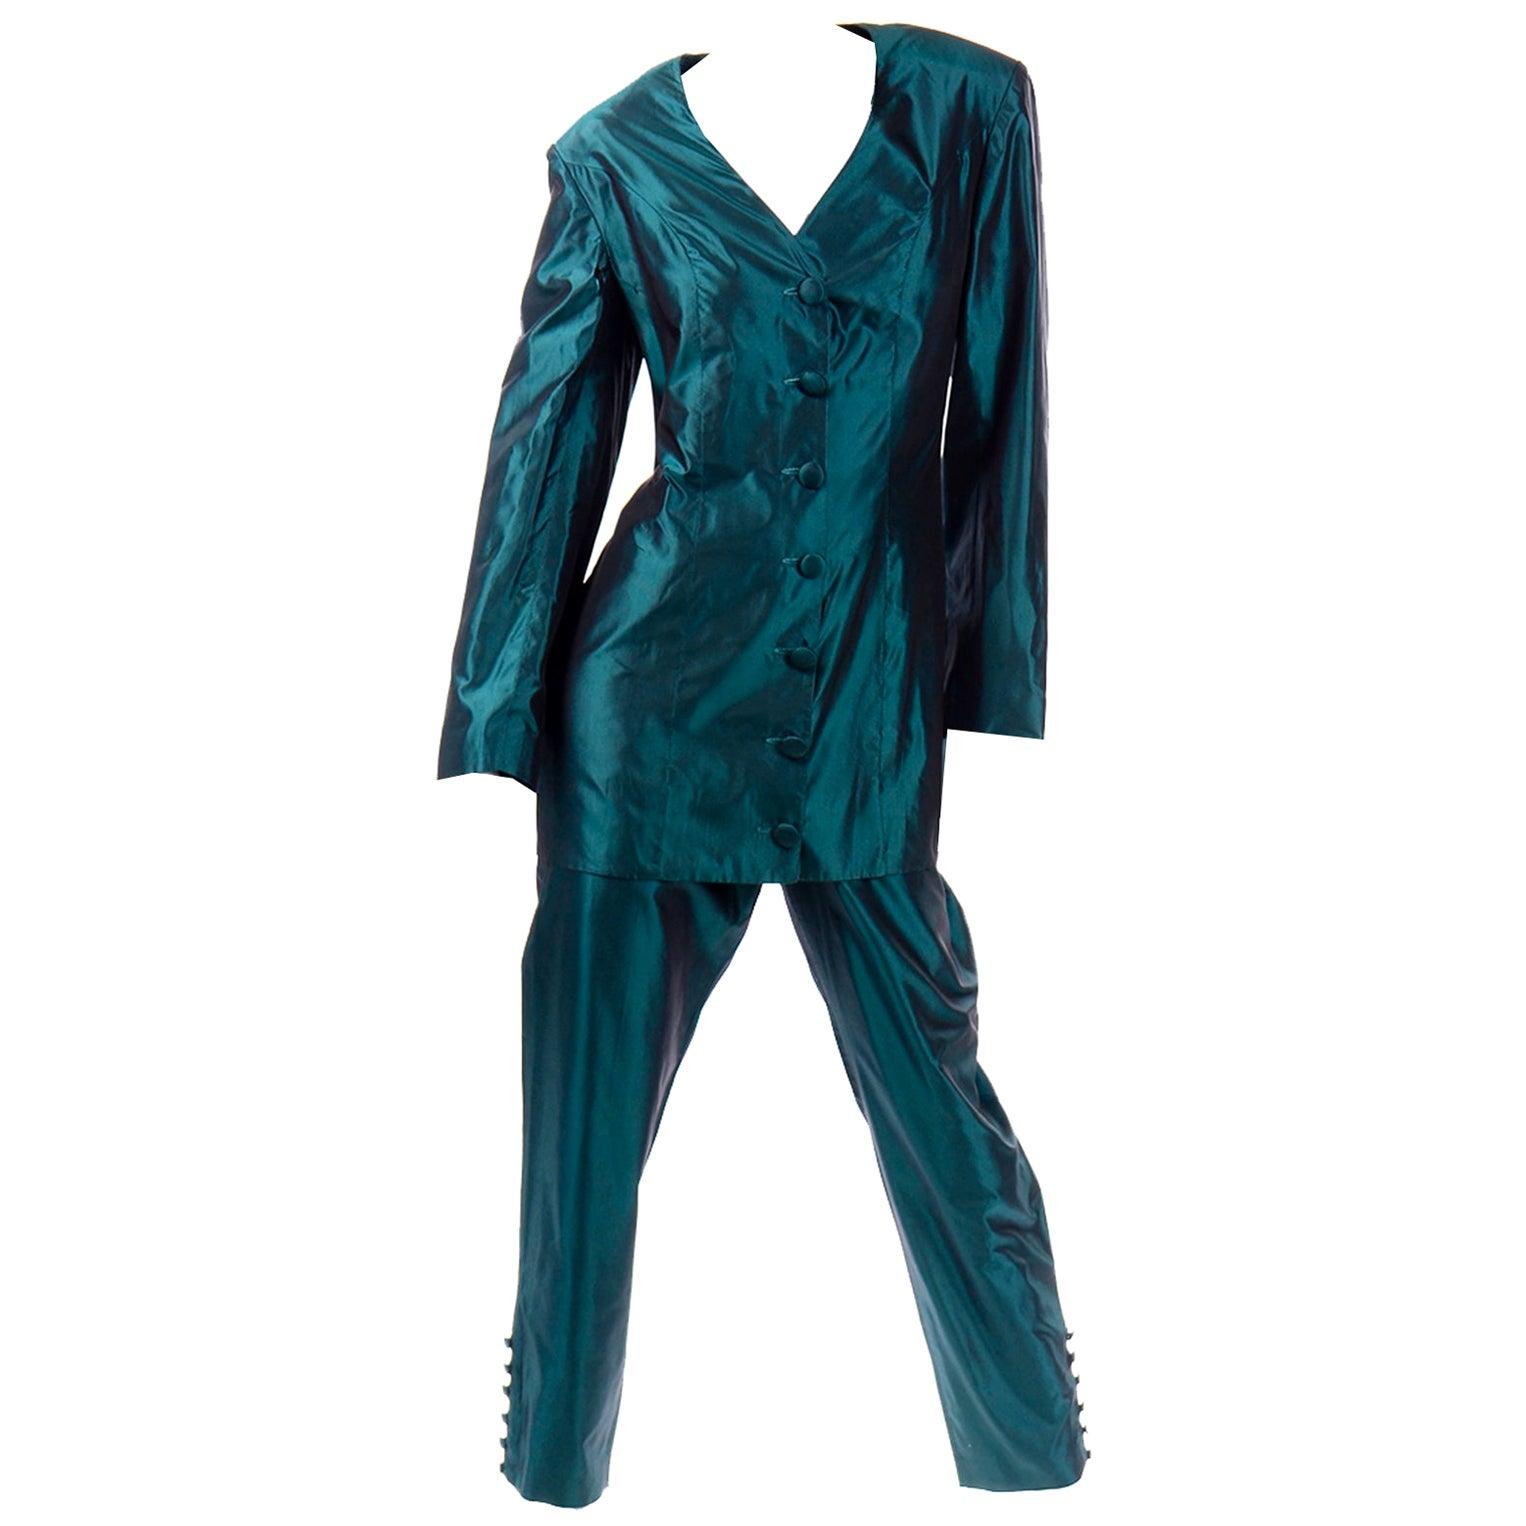 Circolare Maurizio Galante Designed Green Silk Dress Alternative Pantsuit